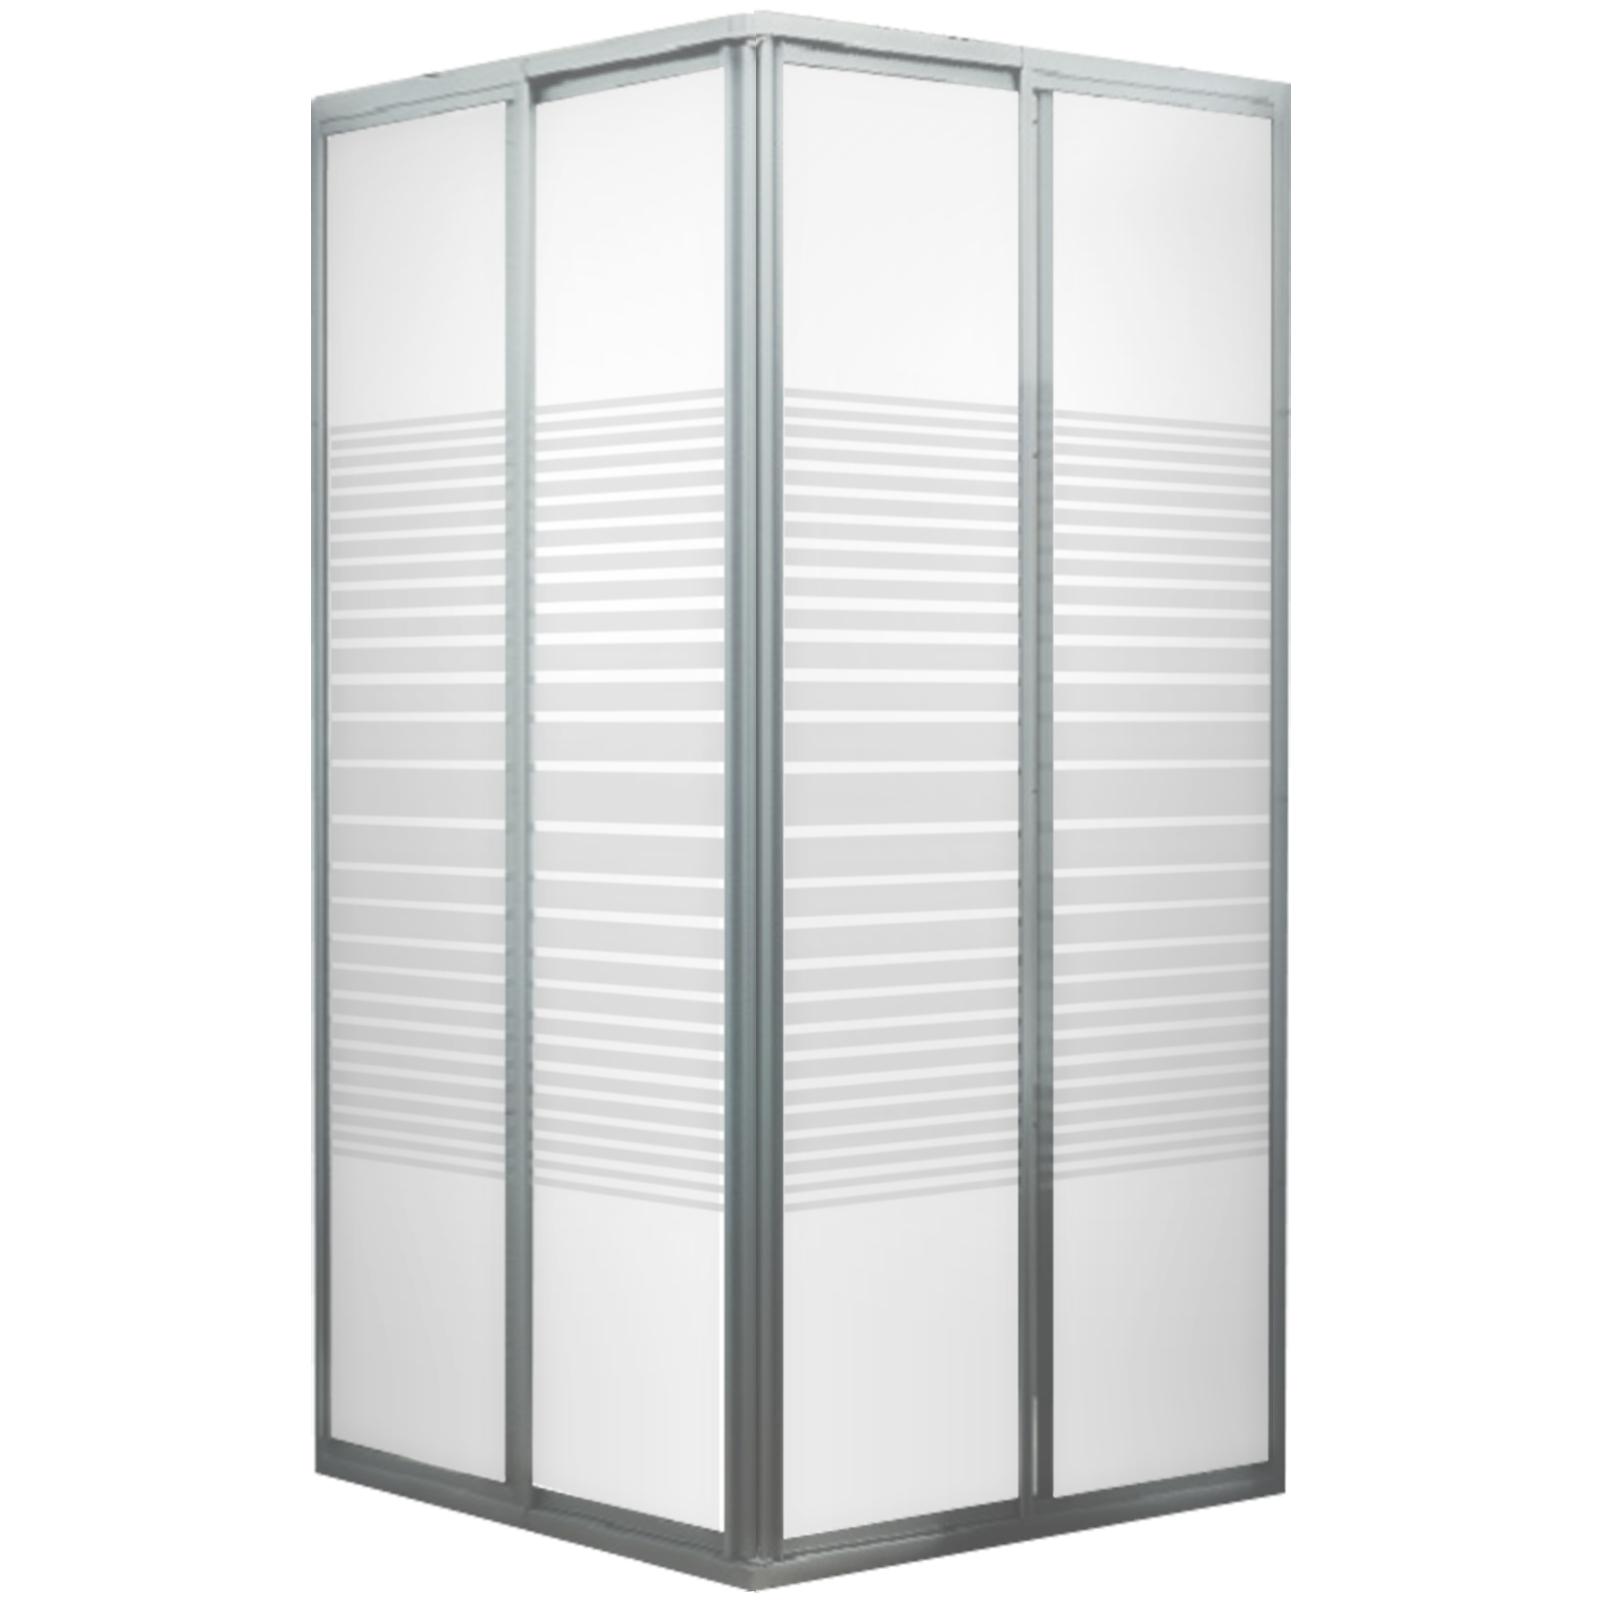 accès d'angle avec portes coulissantes, 88x175 cm, rayures horizontales, Sunny